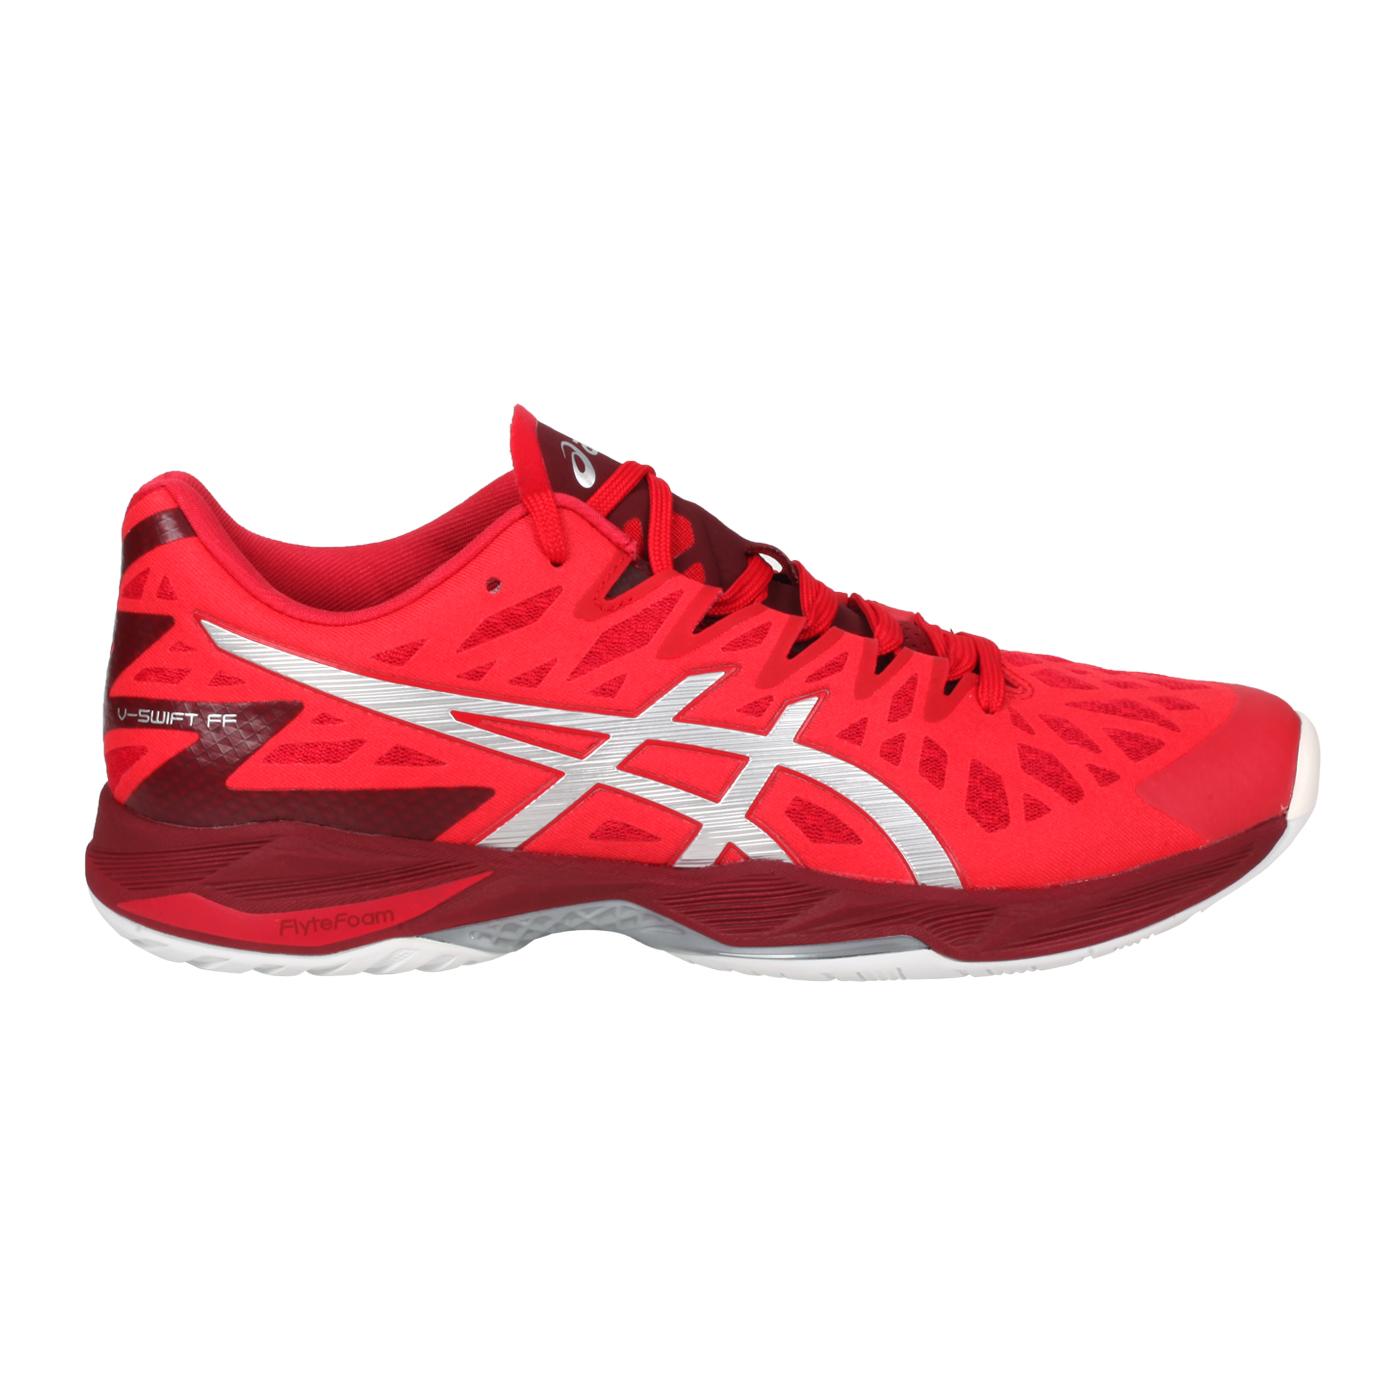 ASICS 男款排羽球鞋  @V-SWIFT FF 2@1053A017-600 - 紅銀